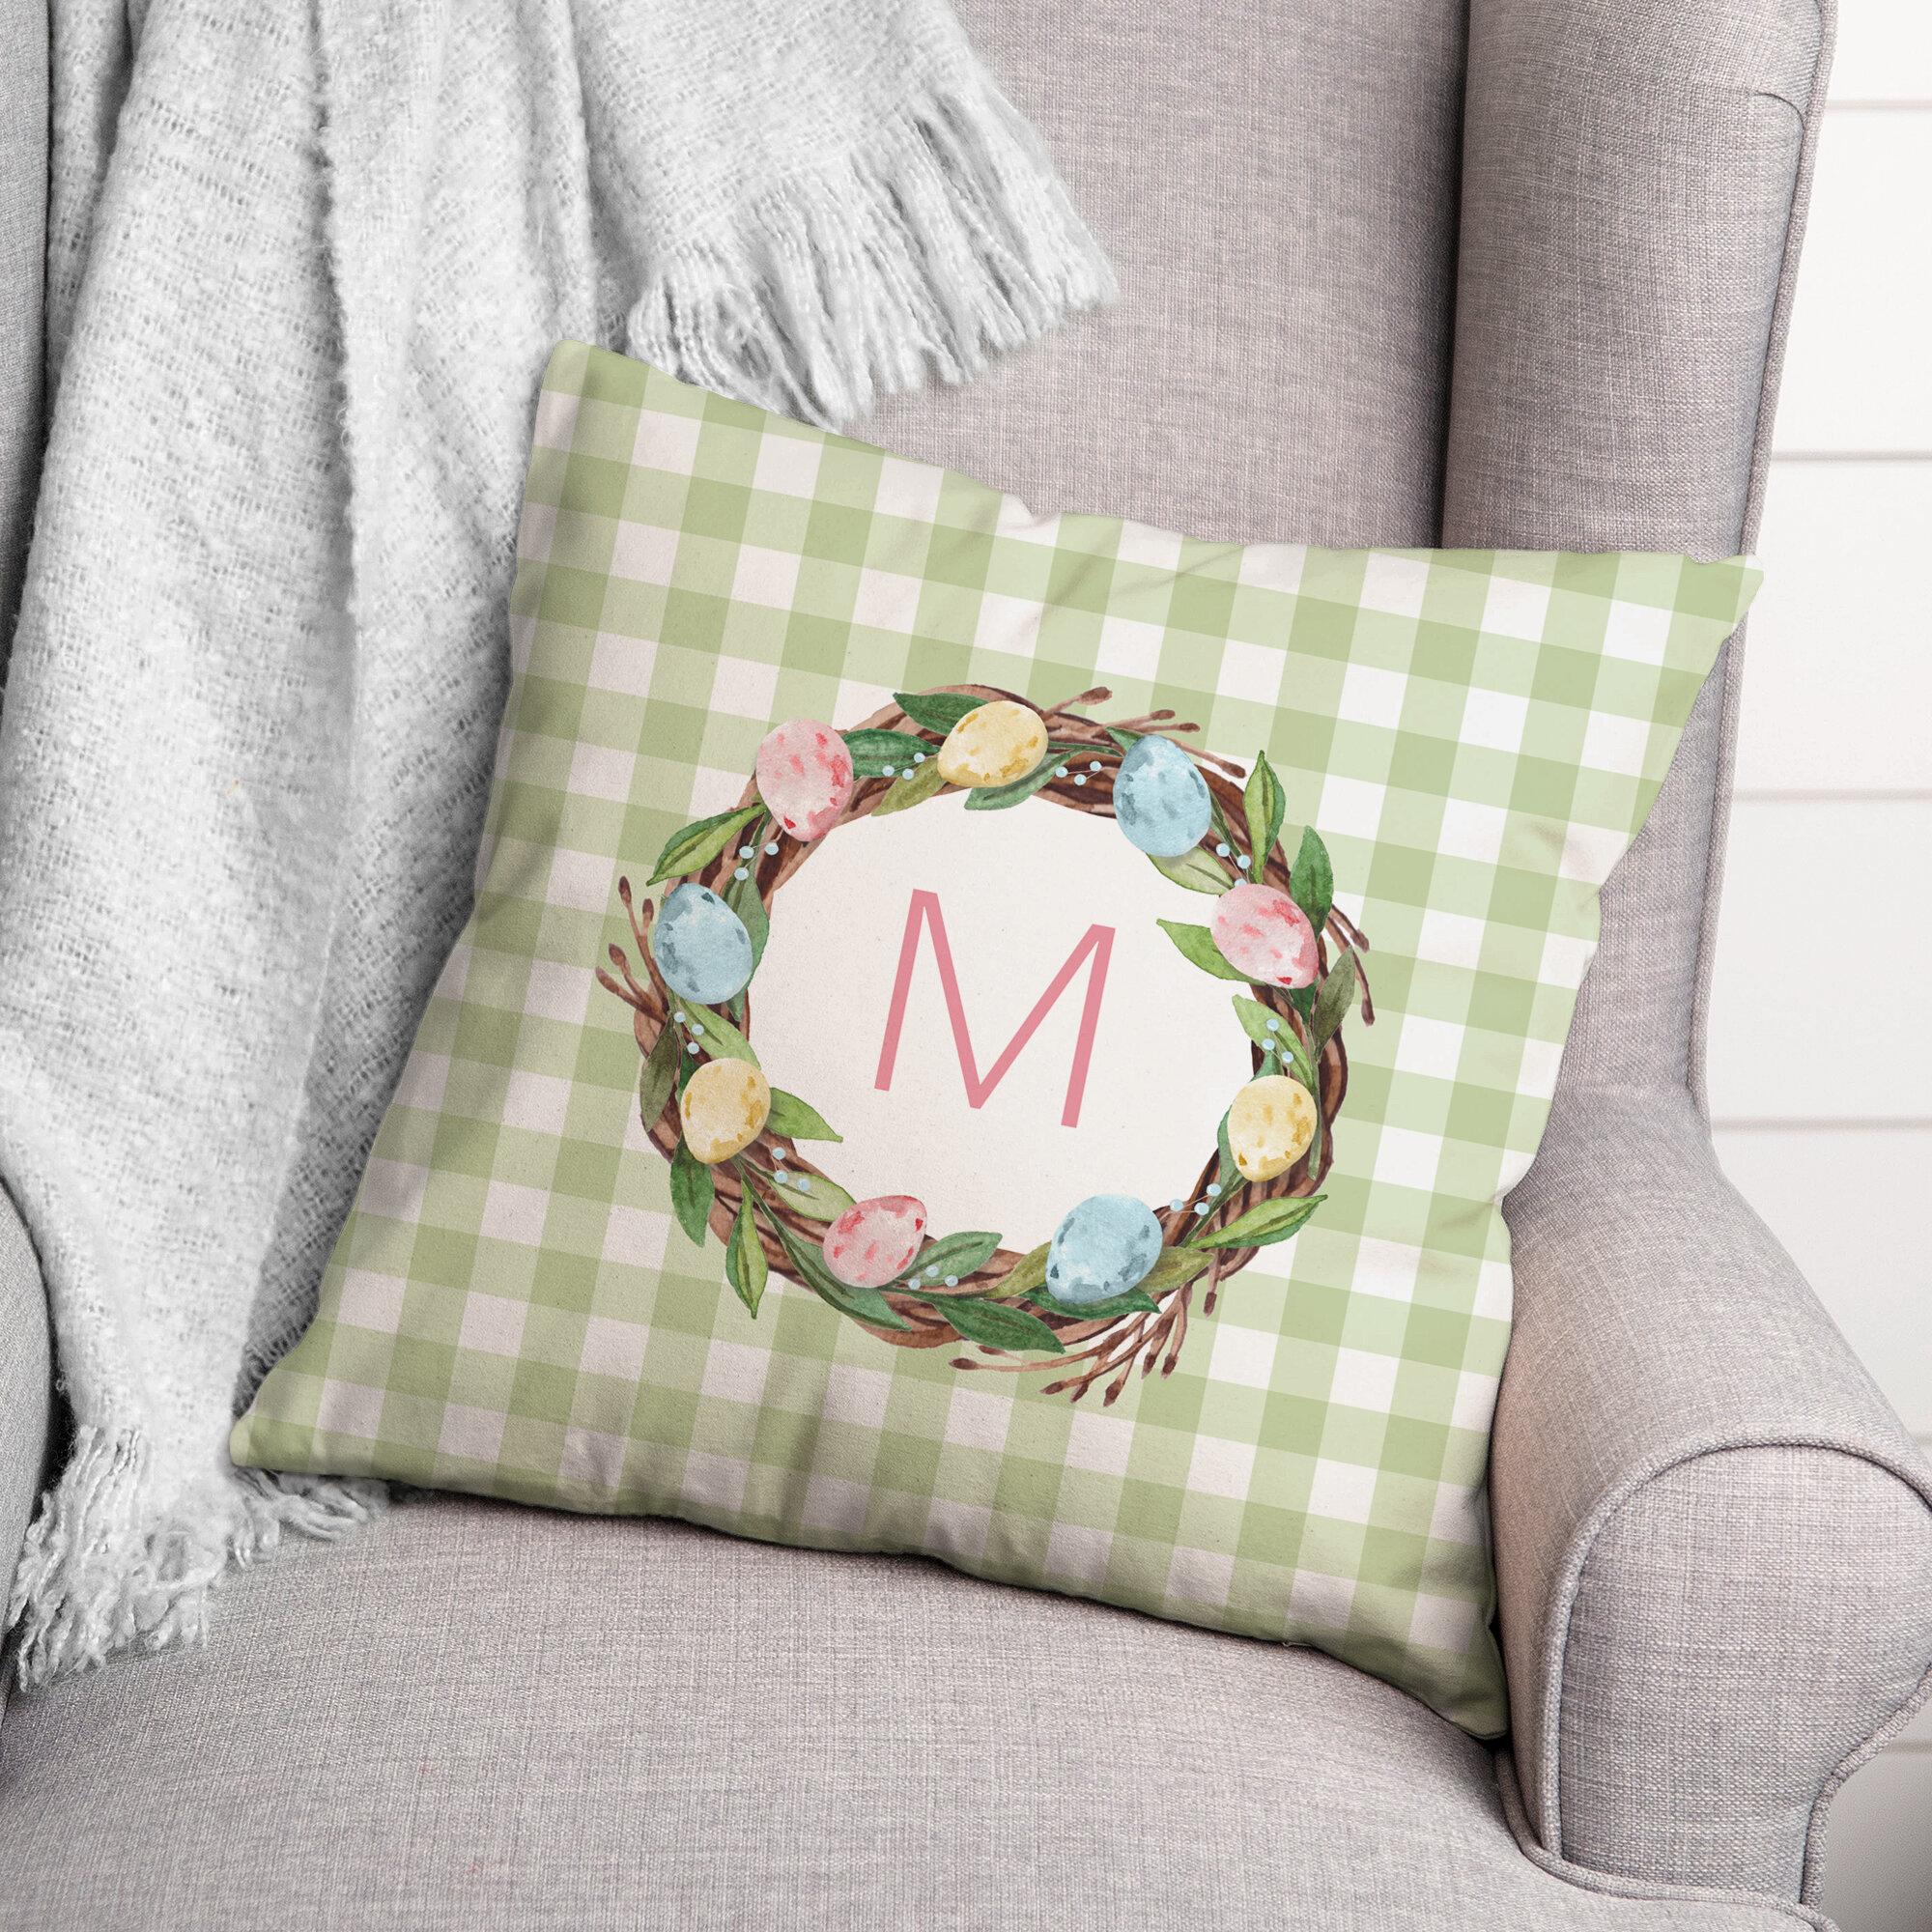 The Holiday Aisle Latour Easter Egg Wreath Monogram Plaid Throw Pillow Wayfair